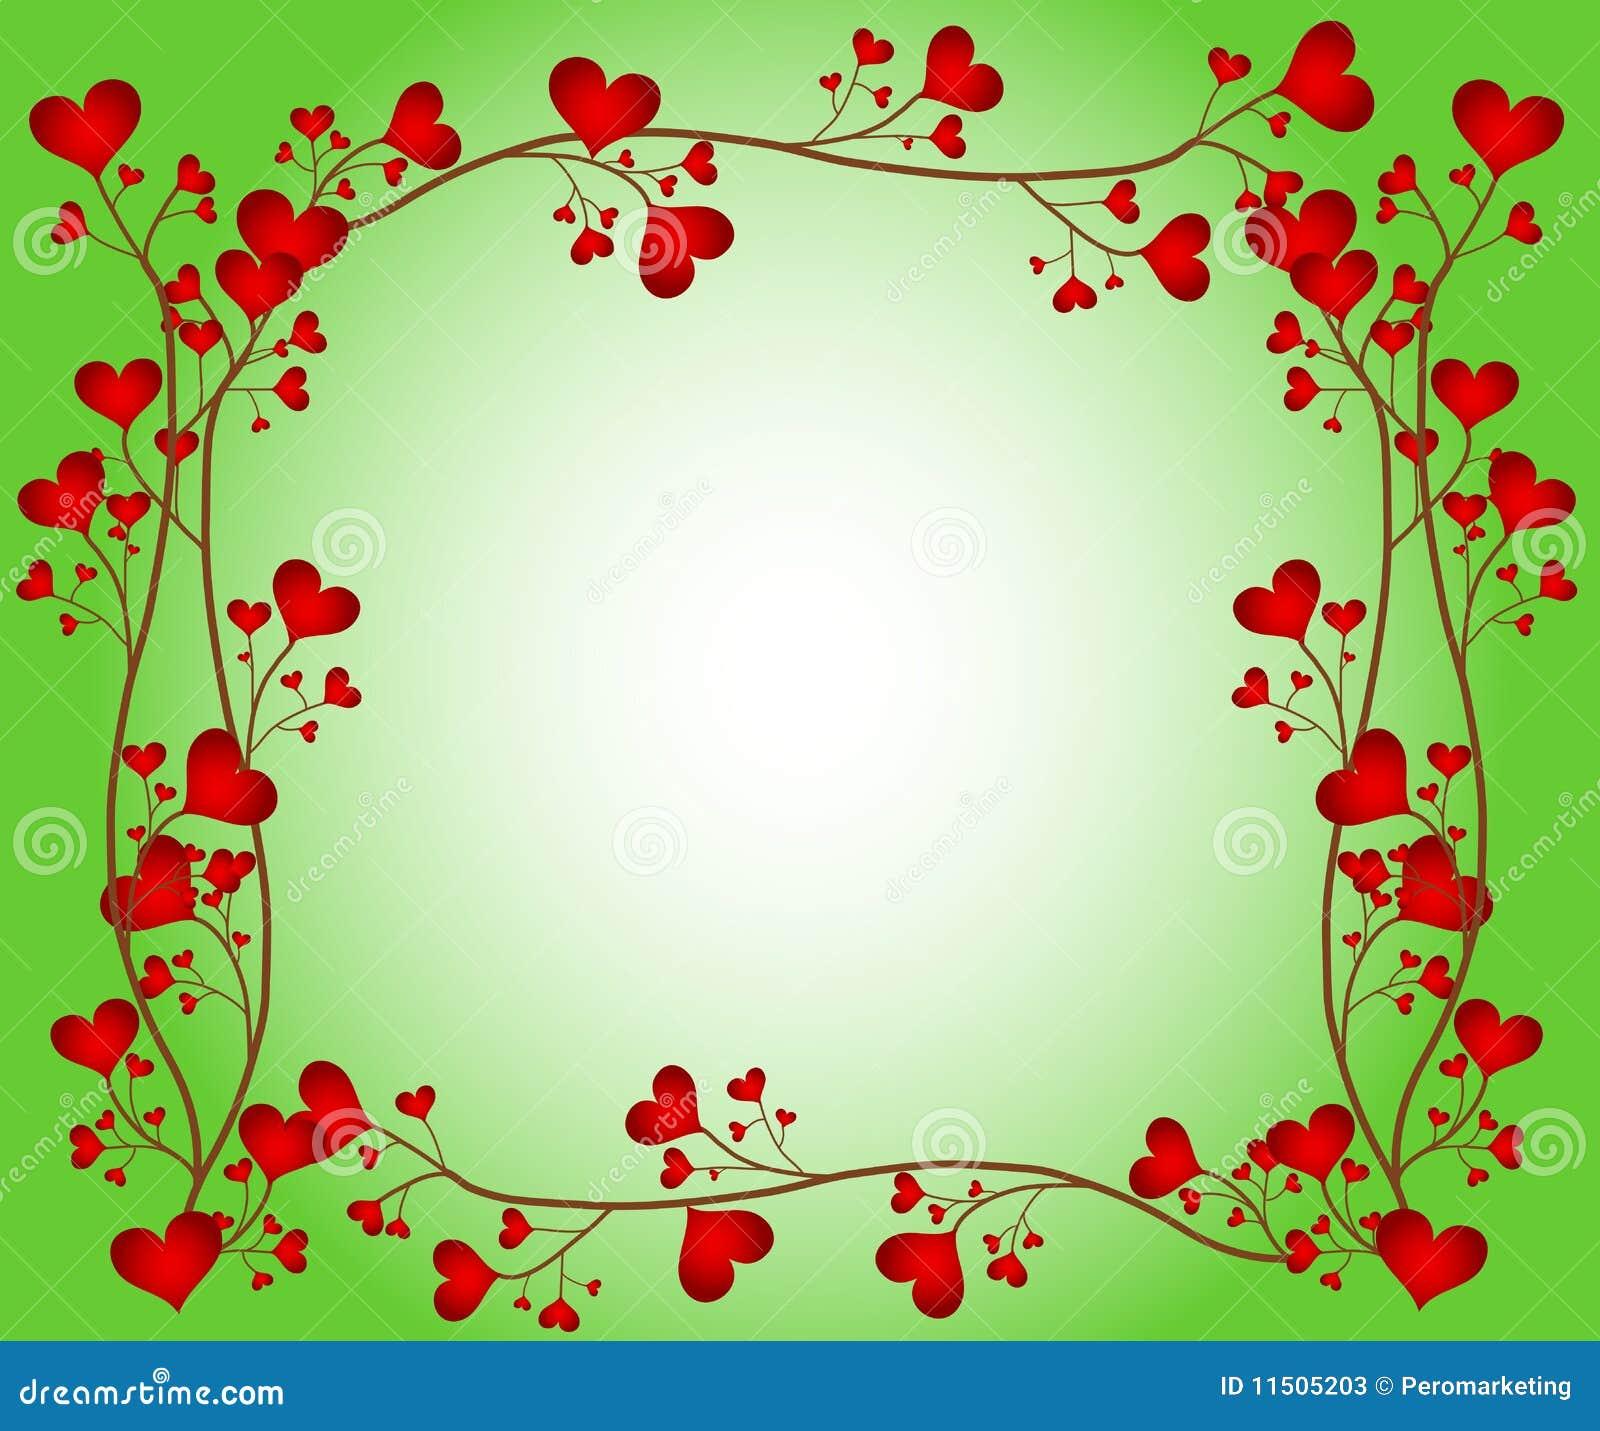 Flower love photo frames | Flower Photo Frame with Love & Emoji